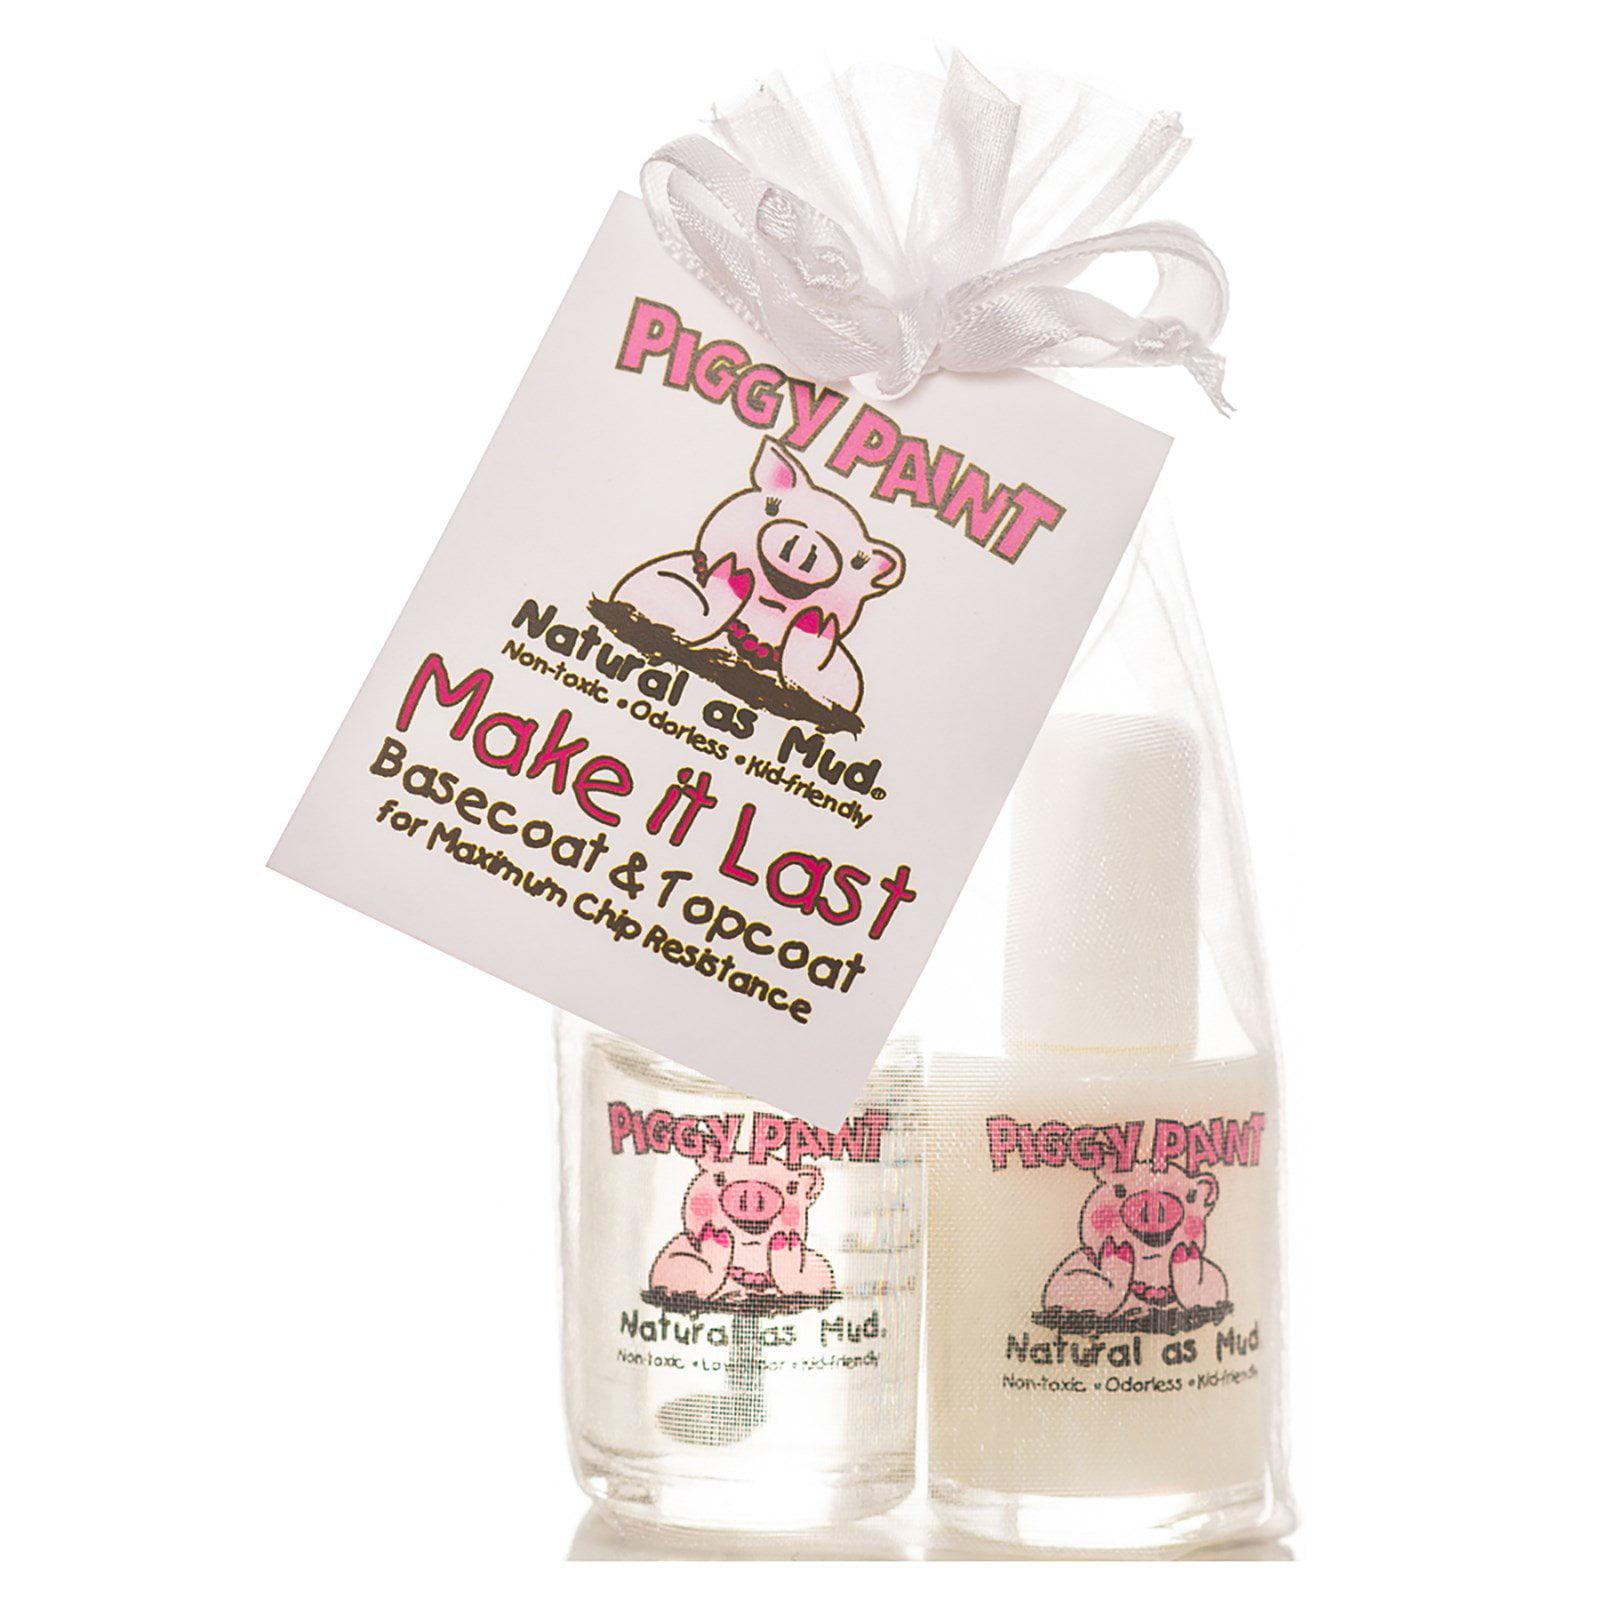 Piggy Paint, Make it Last, Basecoat & Topcoat Nail Polish, 2 Bottles, 0.5 fl oz (15 ml) Each(pack of 2)